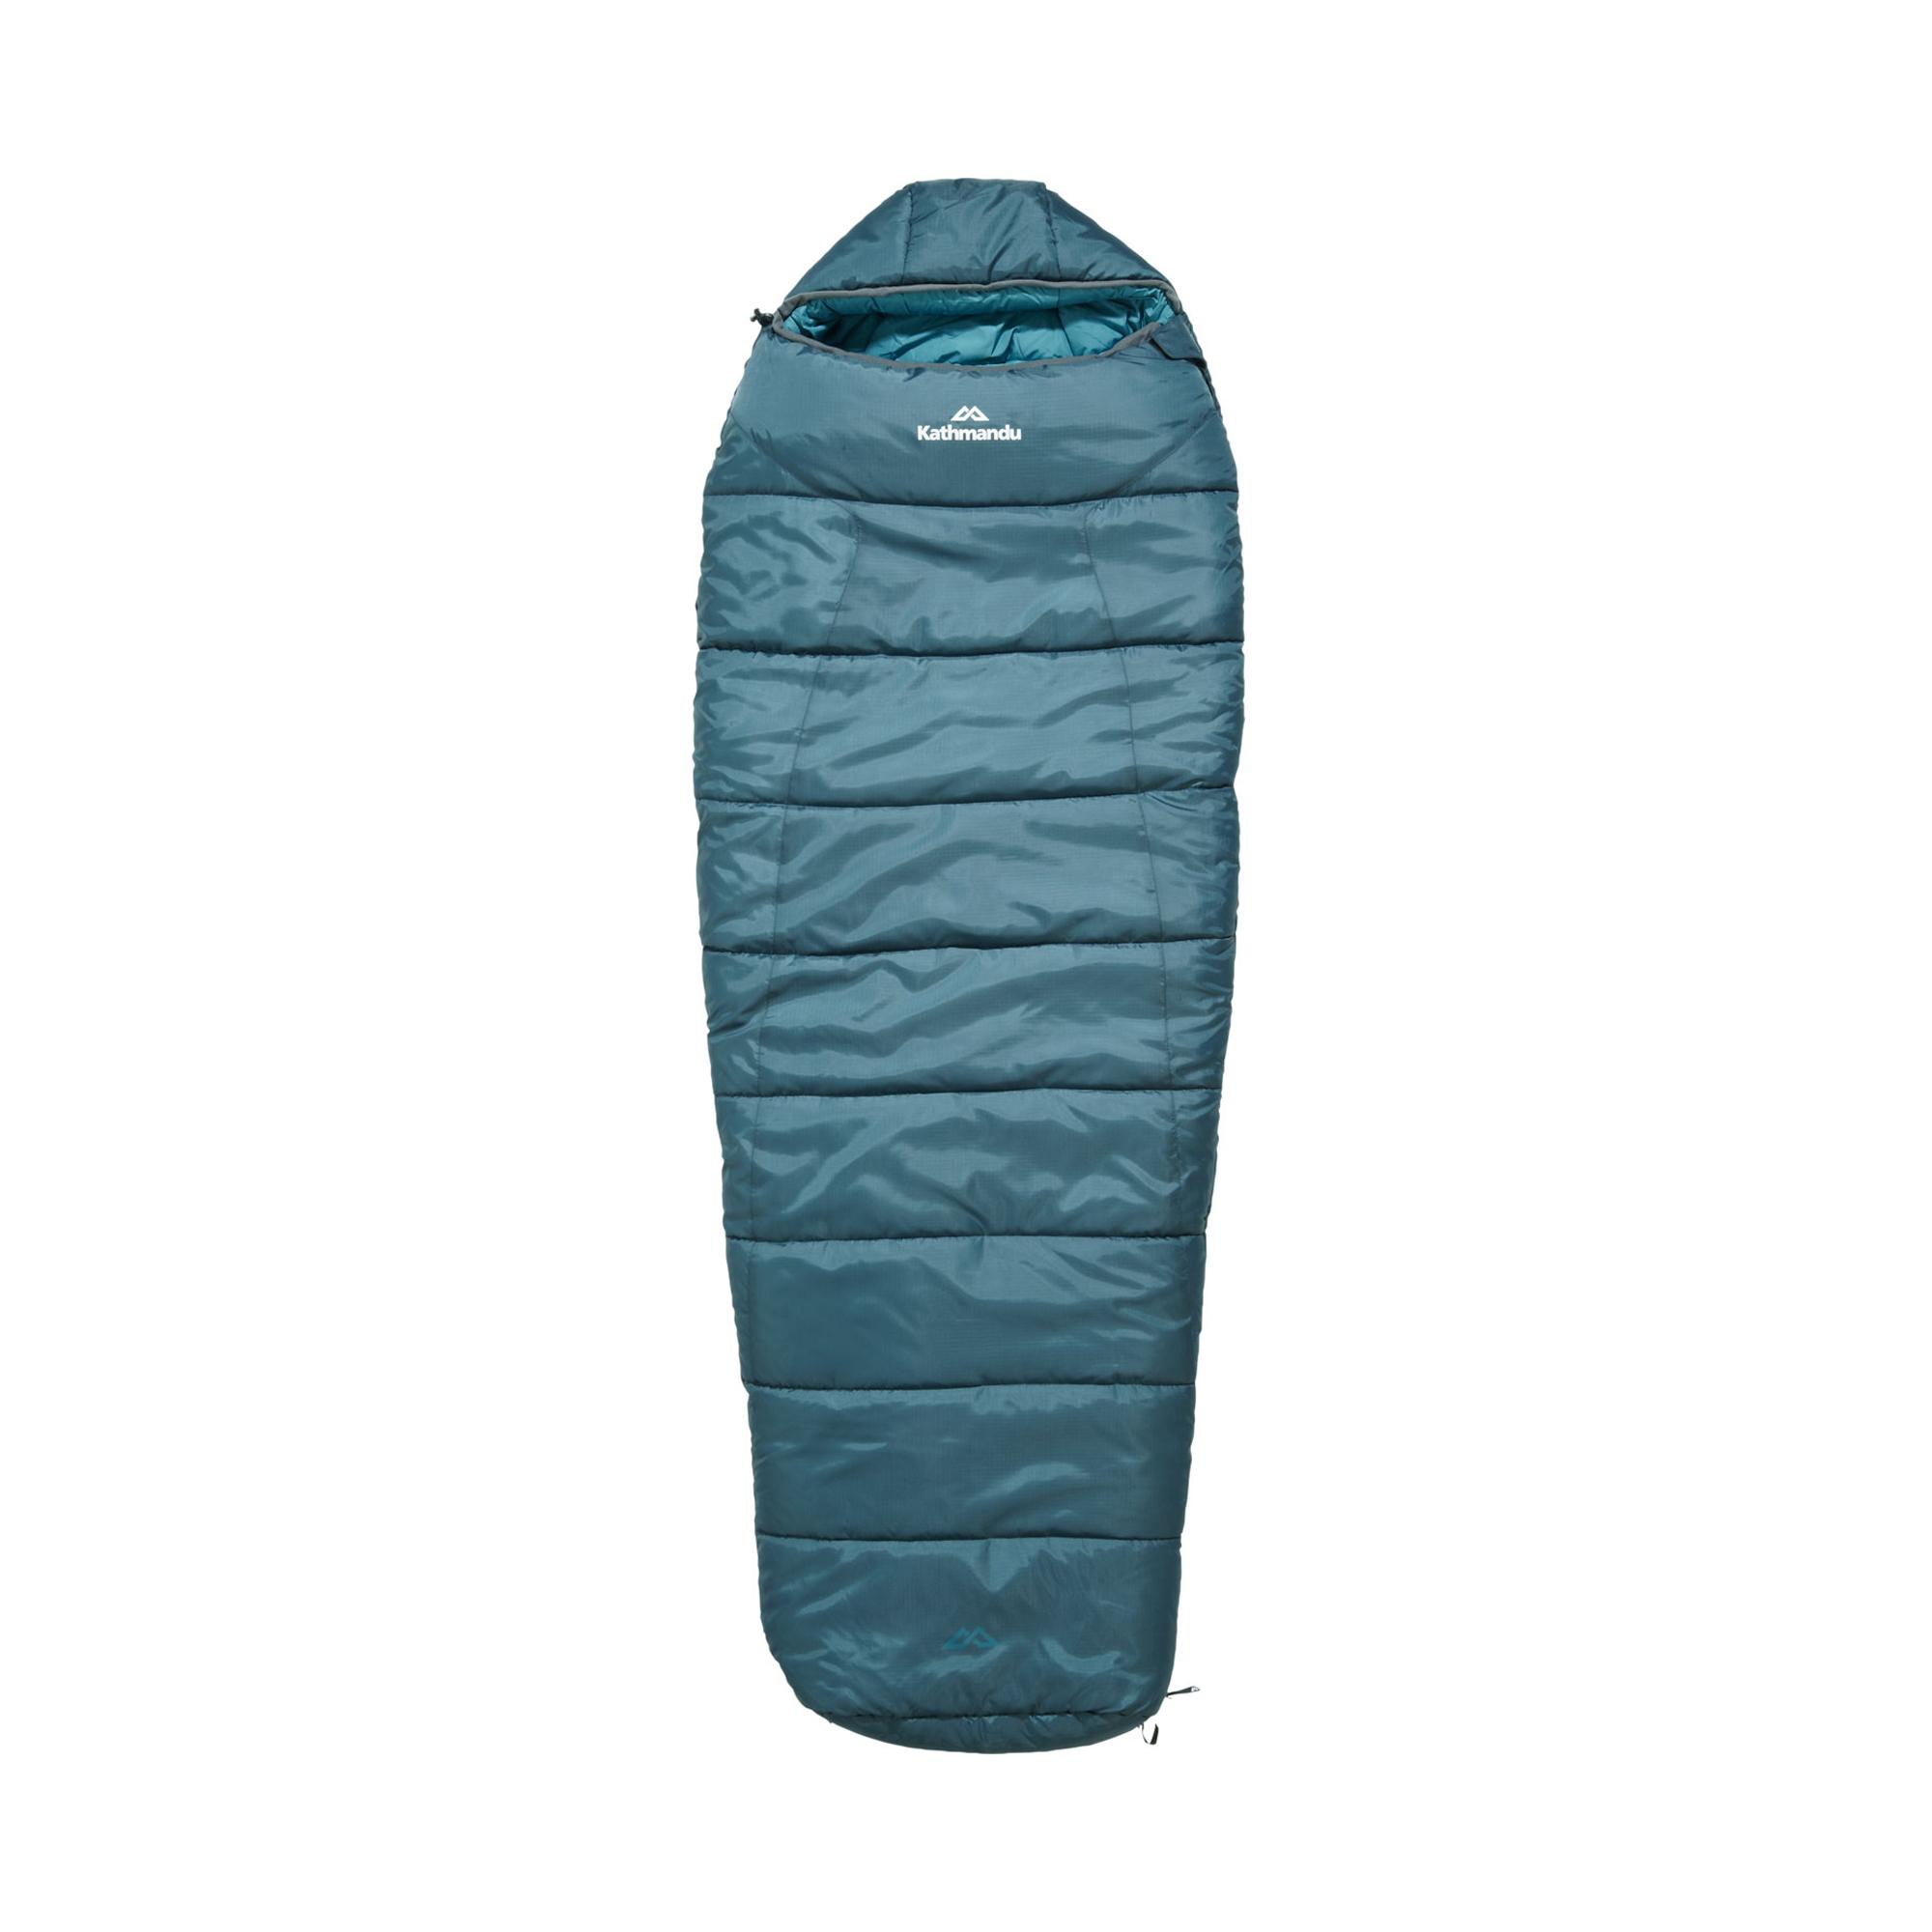 Camper Semi-Rectangular Sleeping Bag